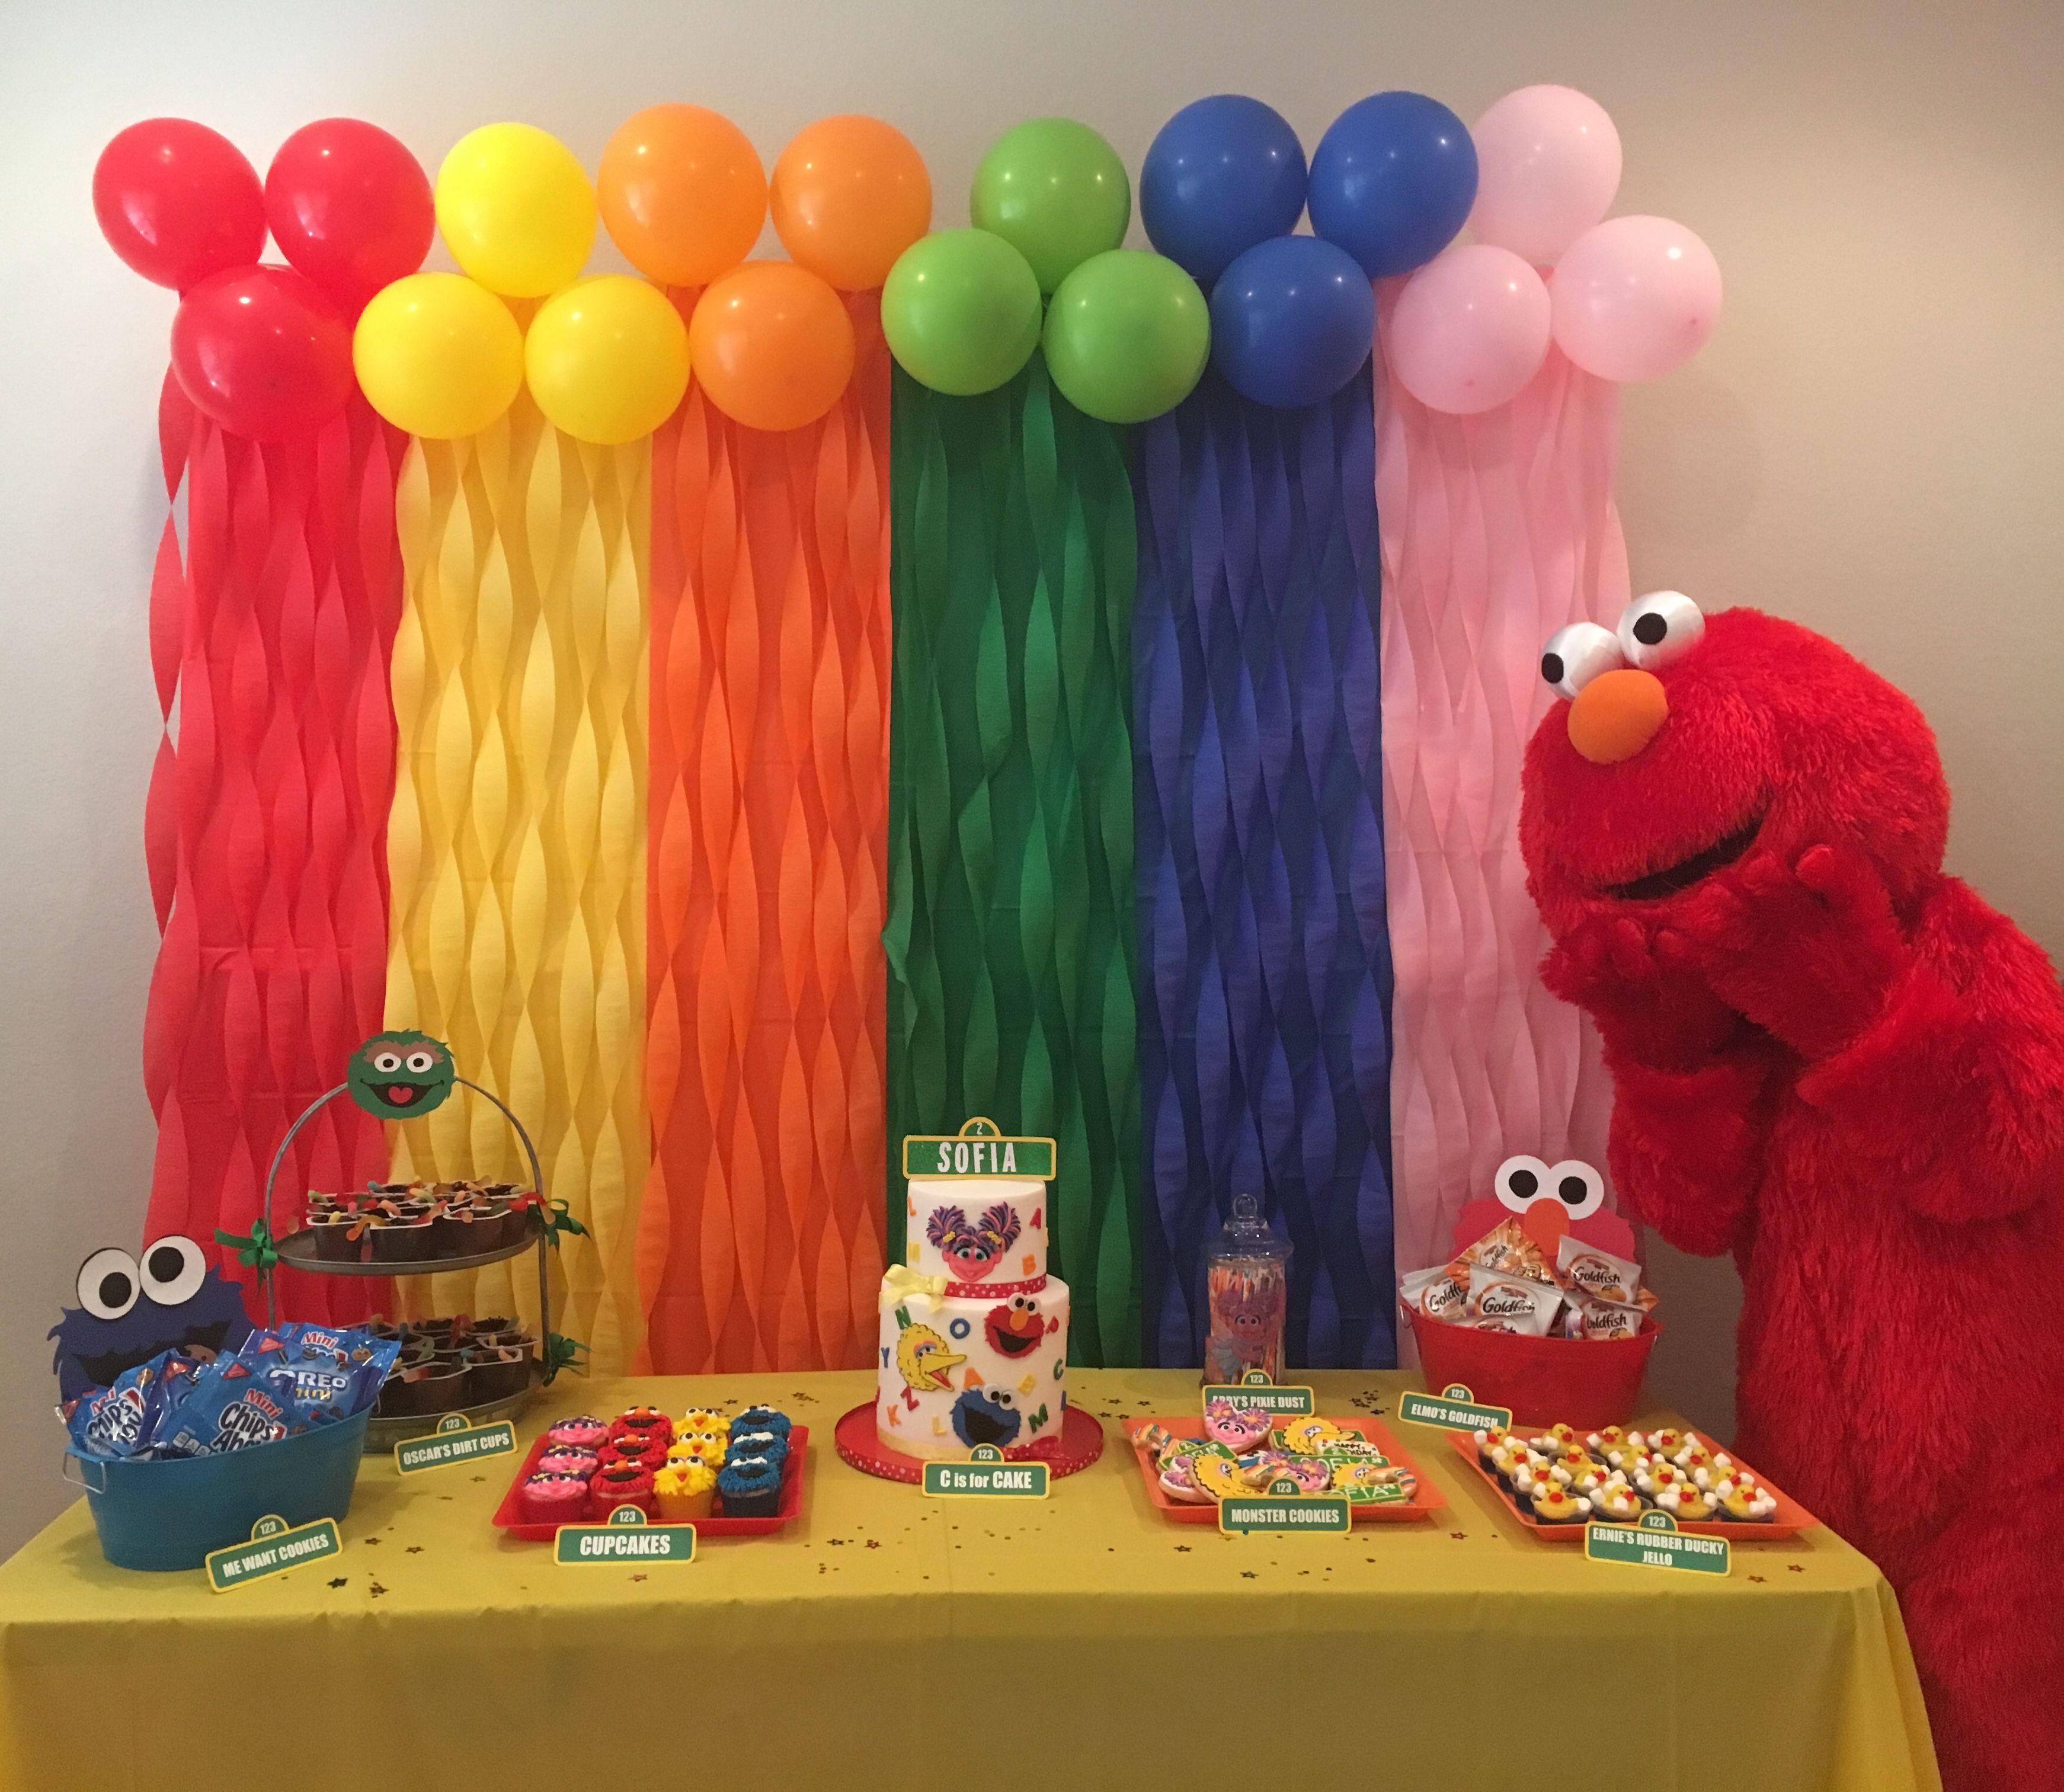 Sesame Street Backdrop Sesame Street Birthday Party Sesame Street Birthday Elmo Birthday Party